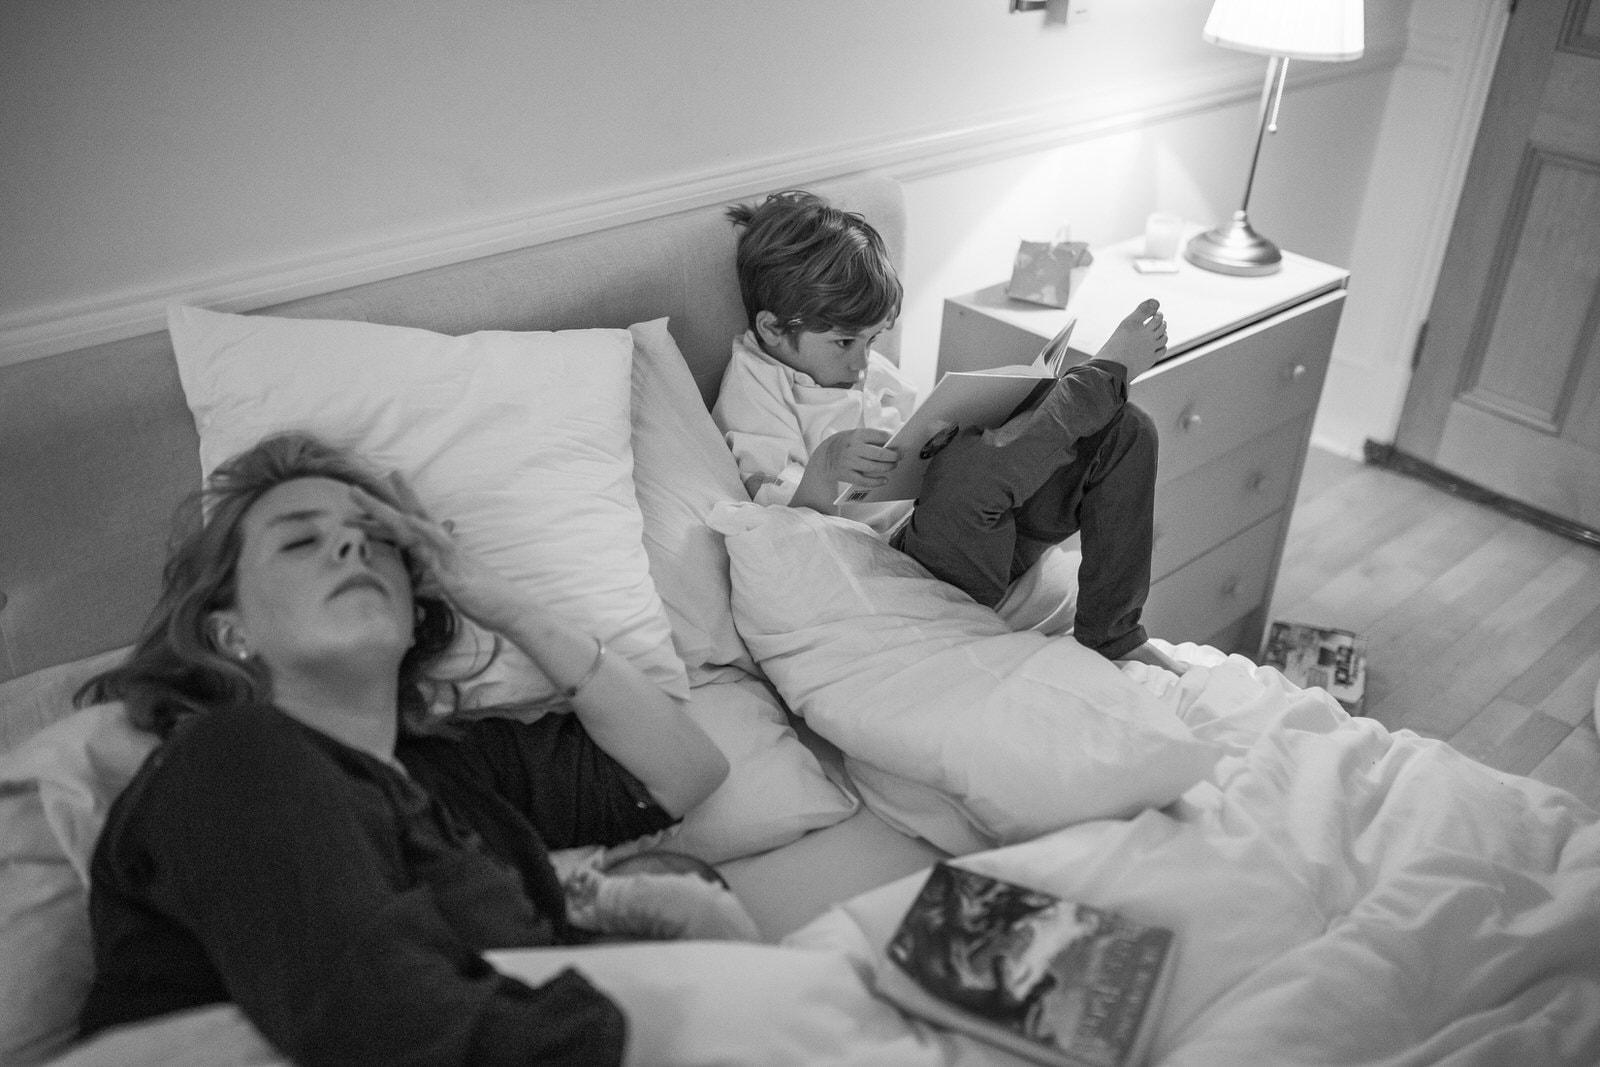 kensington-day-in-the-life-documentary-family-photographs-0101